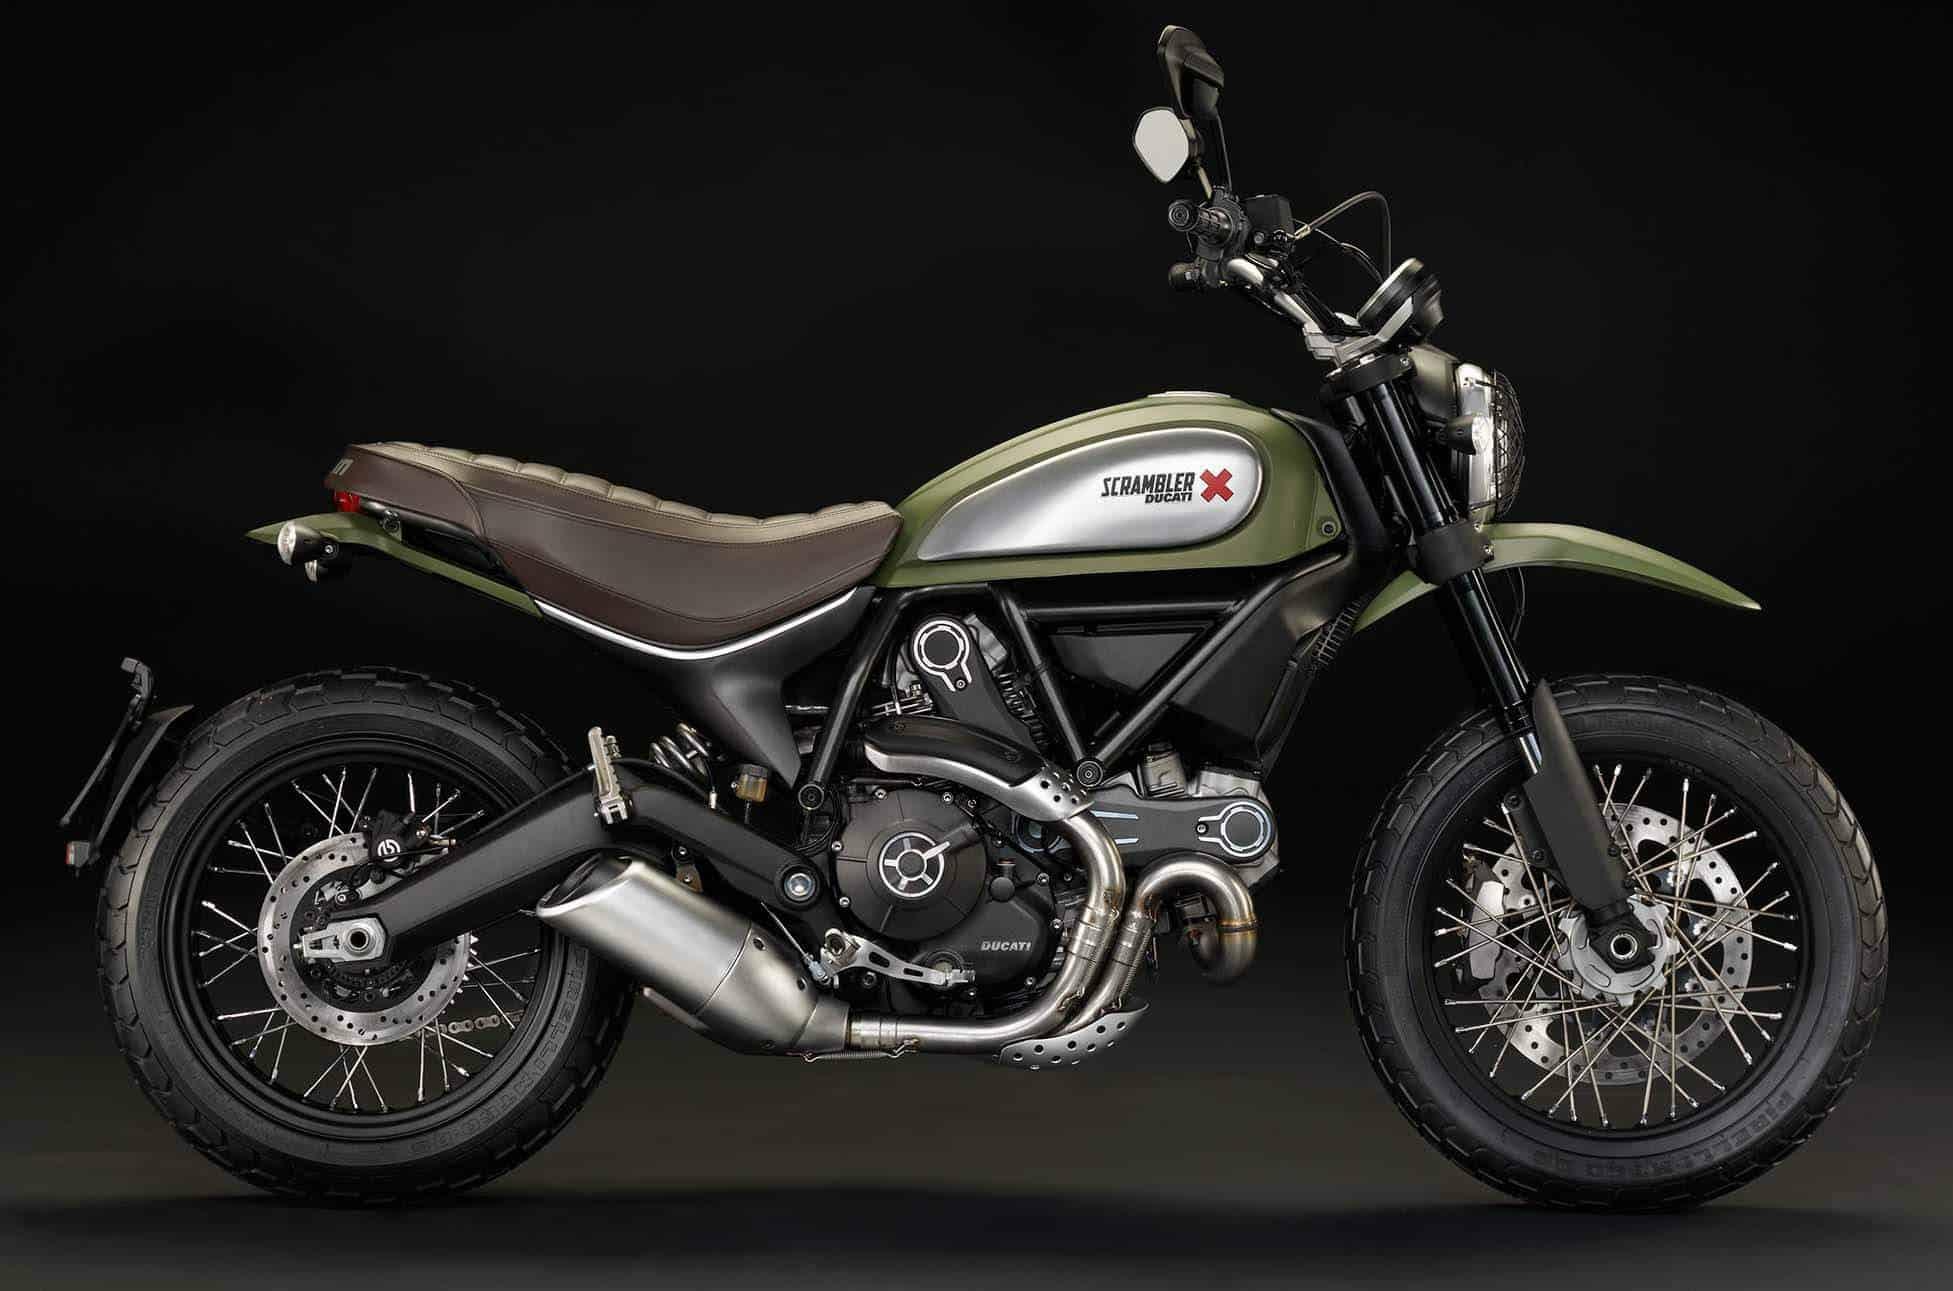 Ducati Urban Enduro – commuter motorcycle